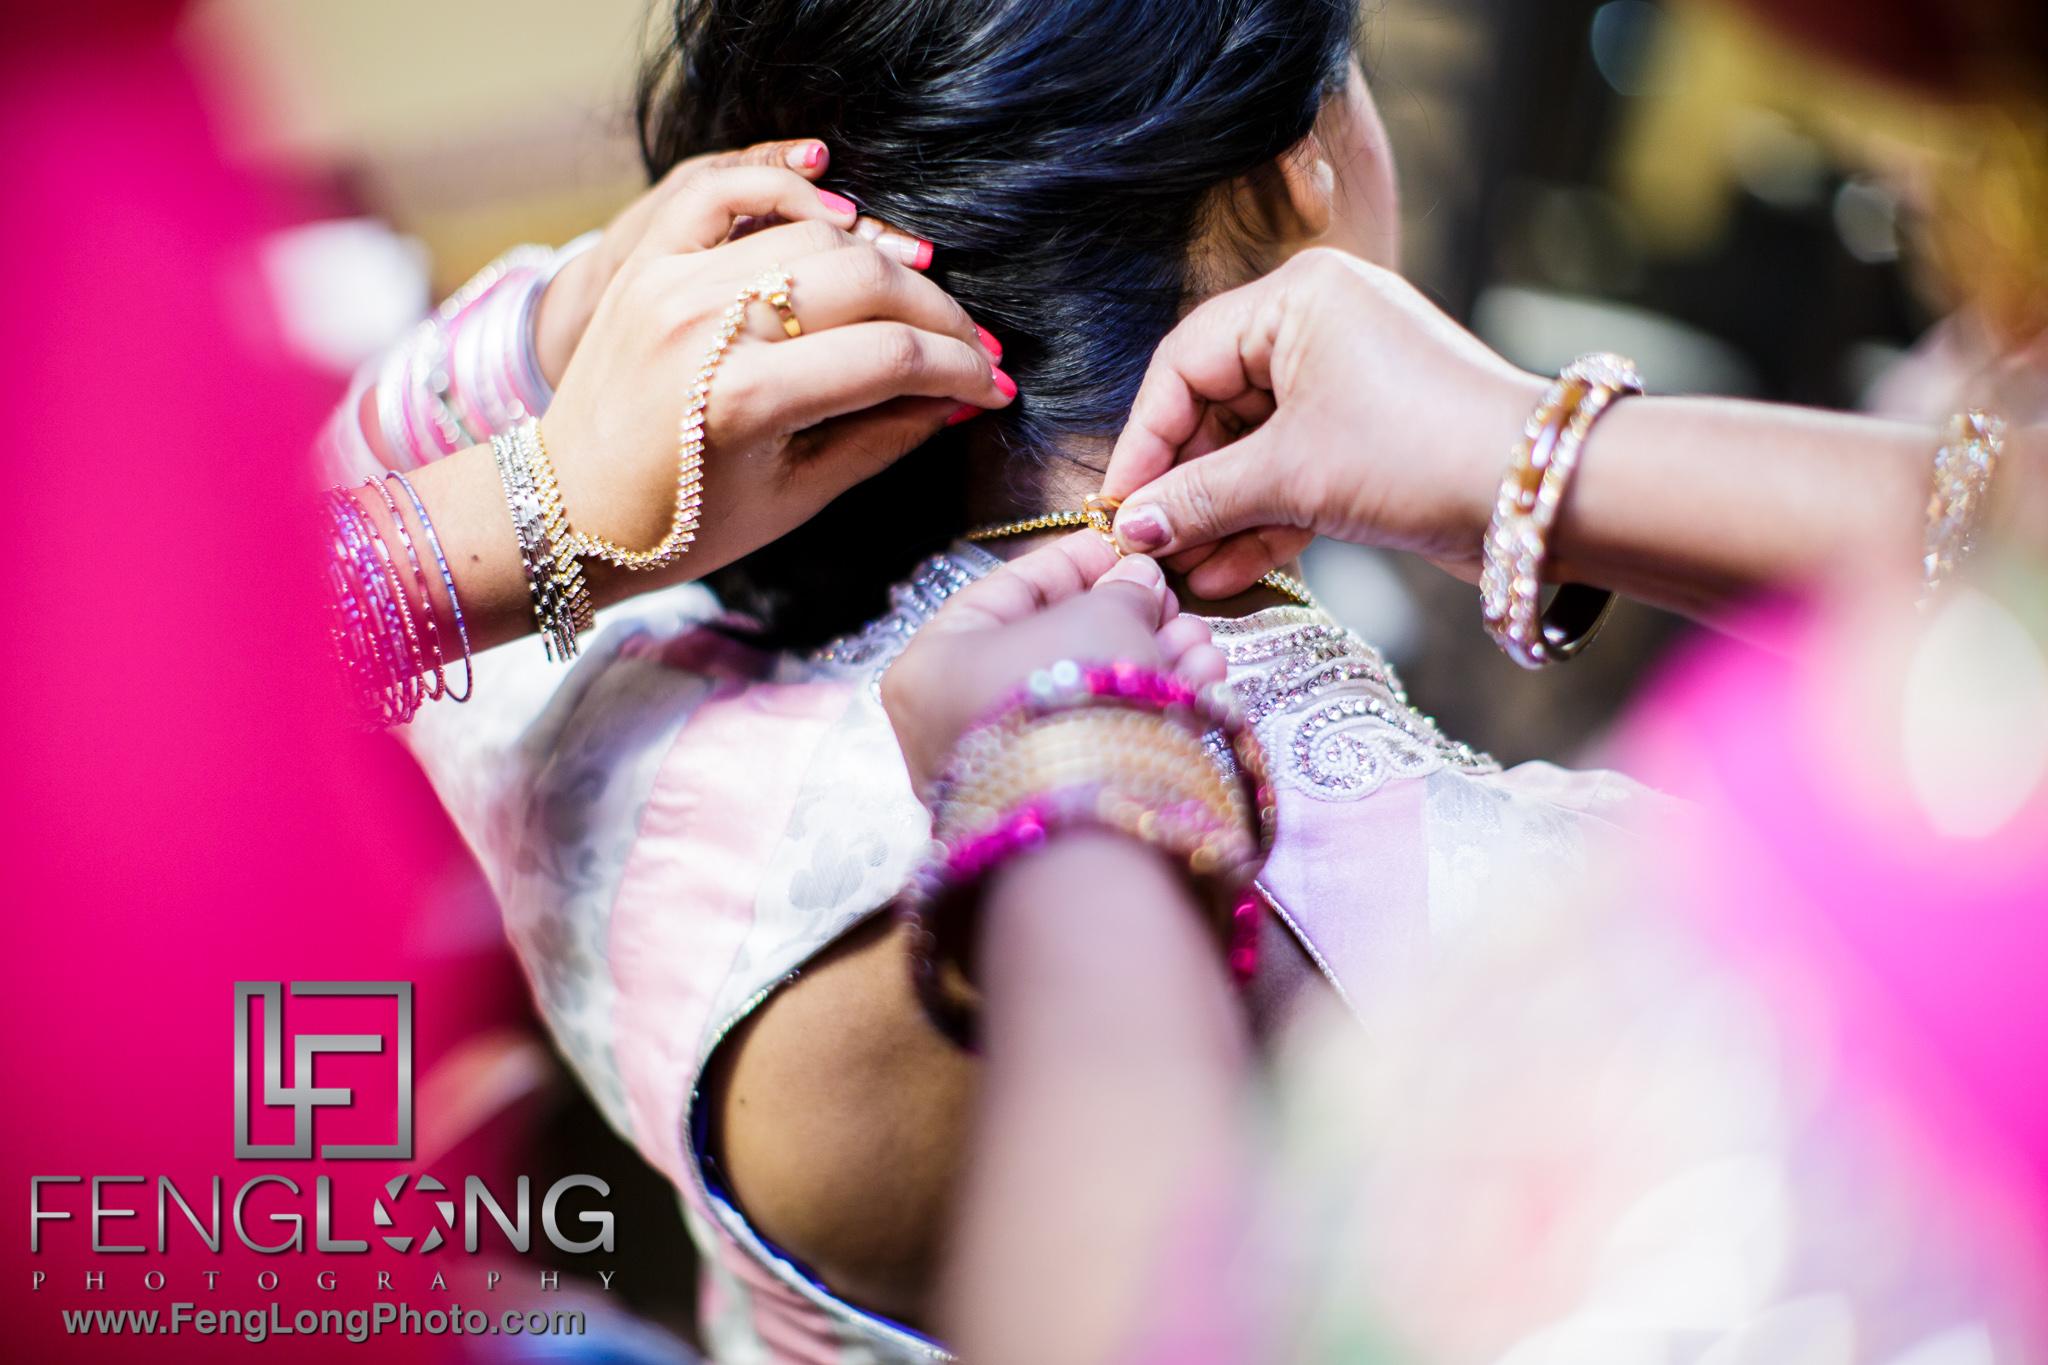 atlanta-bengali-indian-wedding-engagement-5314